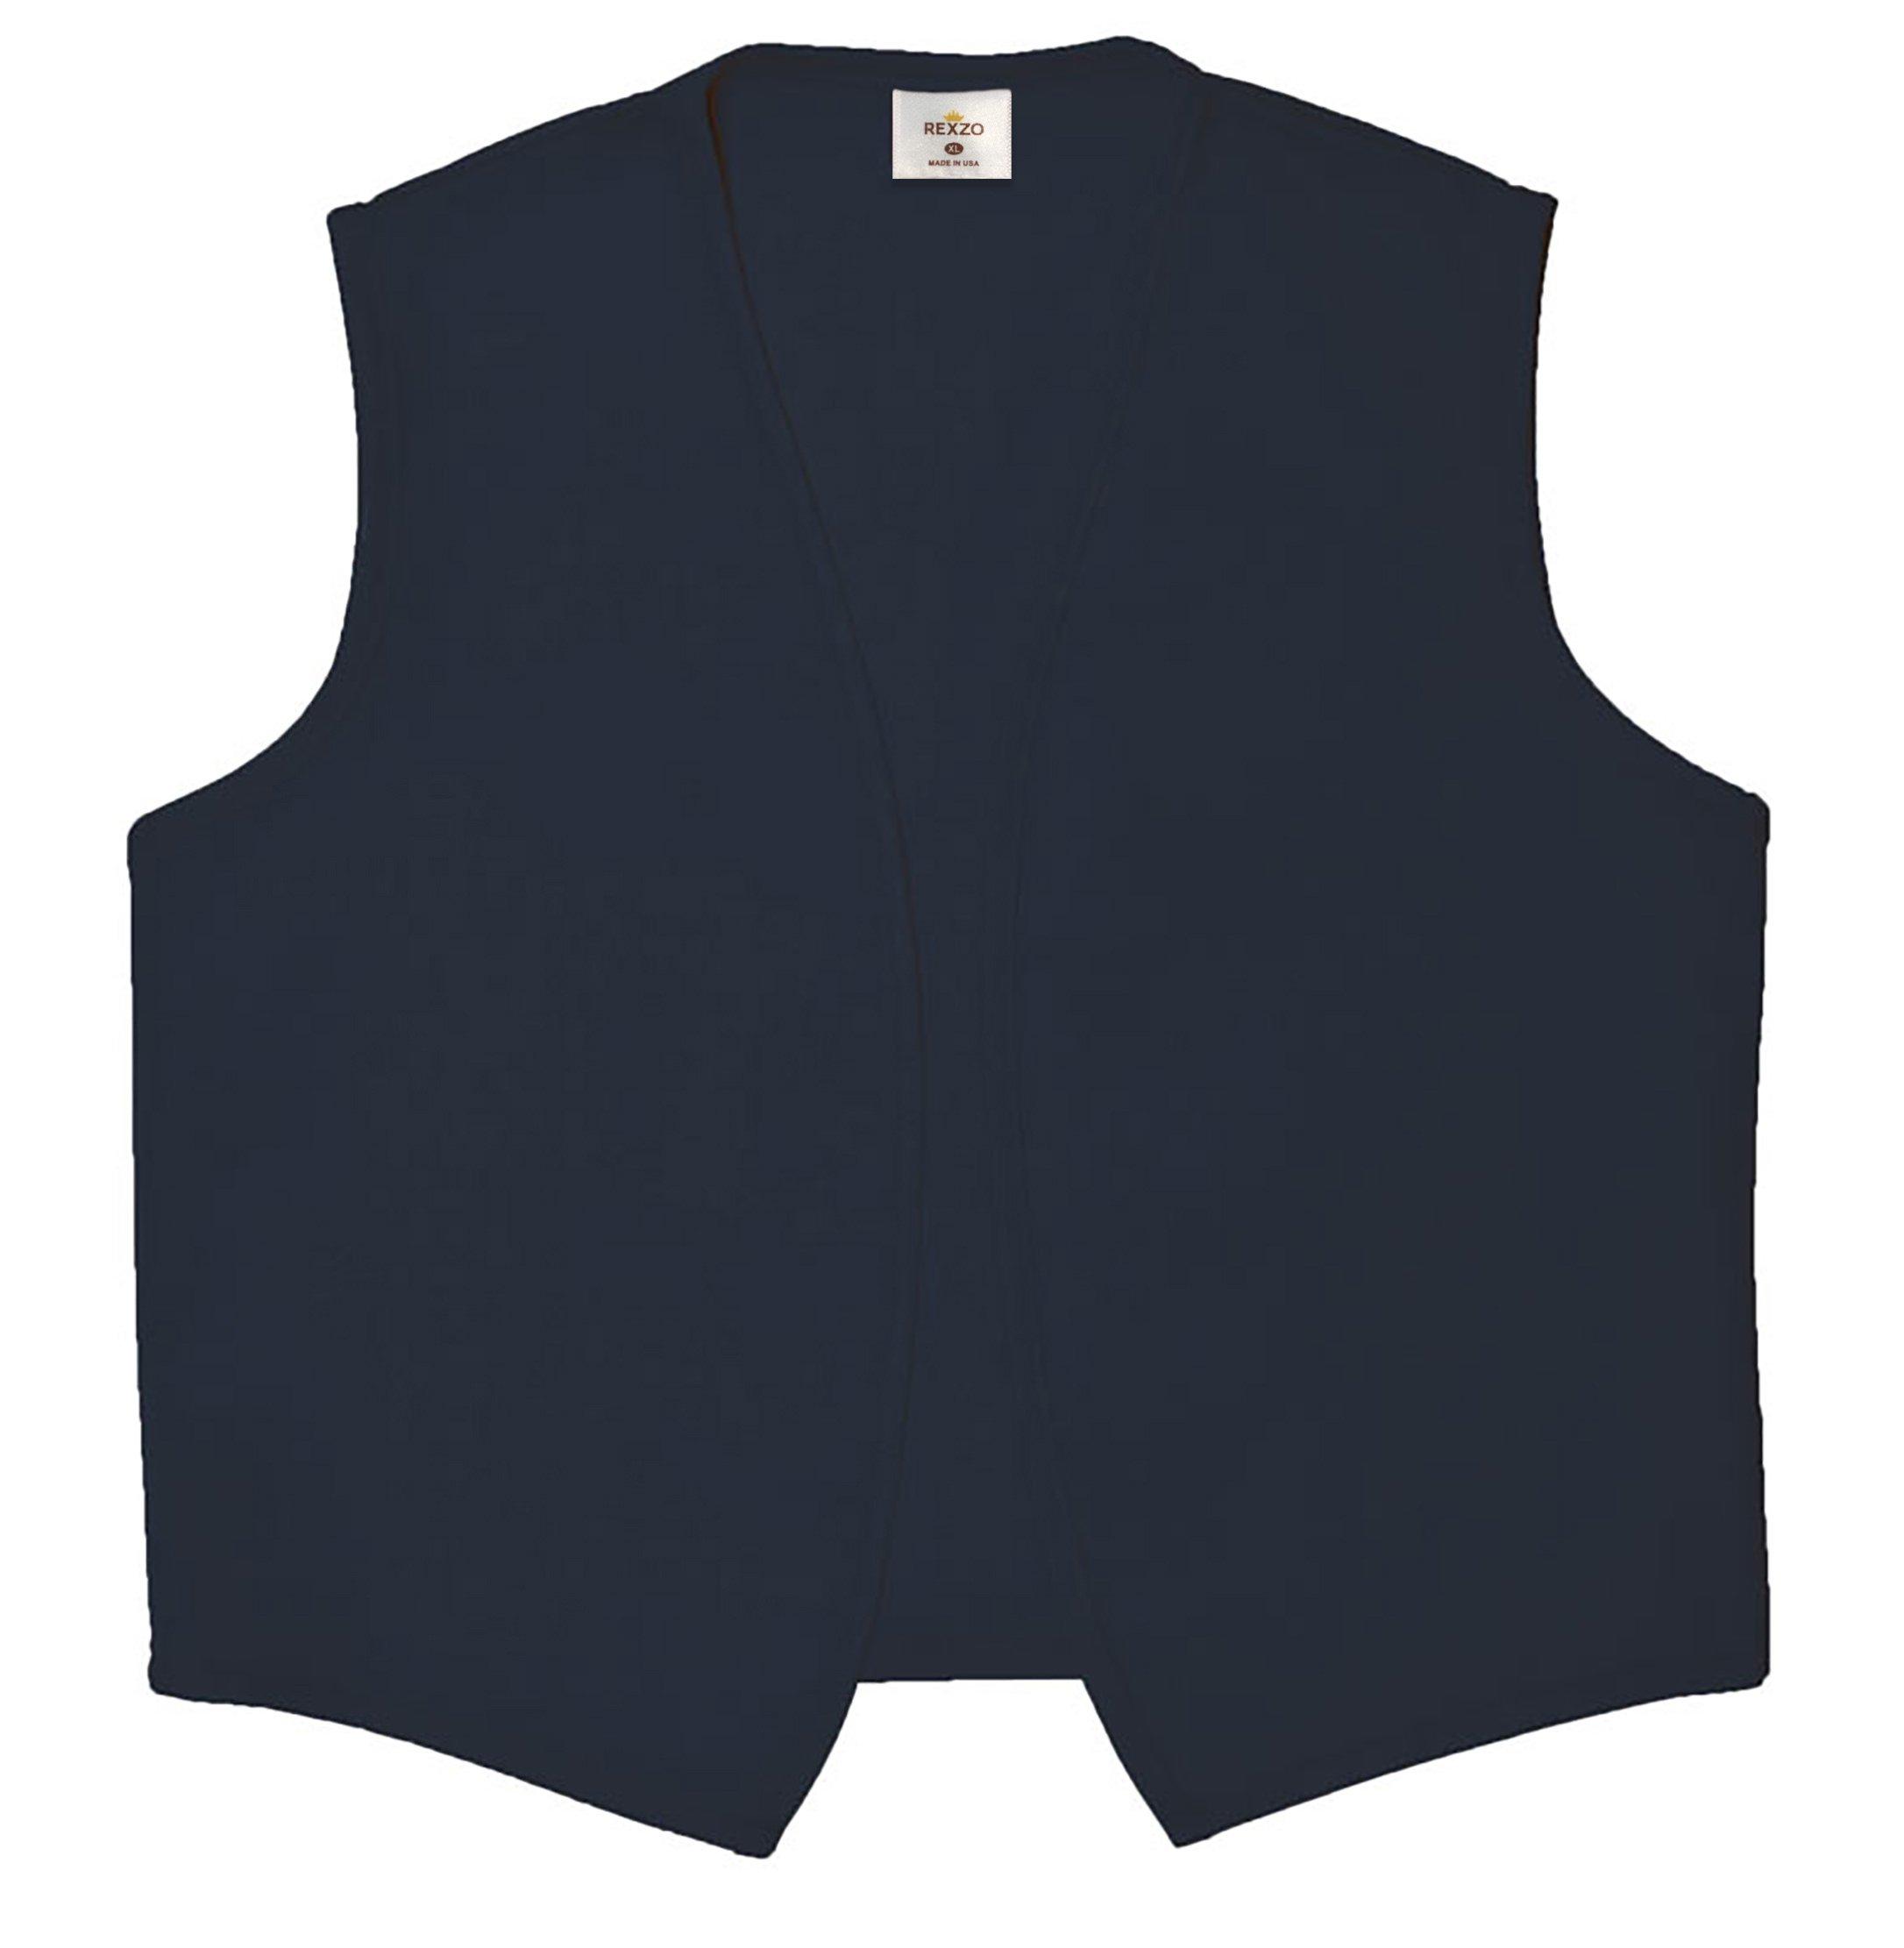 Rexzo Unisex Vest No Pocket No Buttons- Made in The USA - Navy, Medium by Rexzo